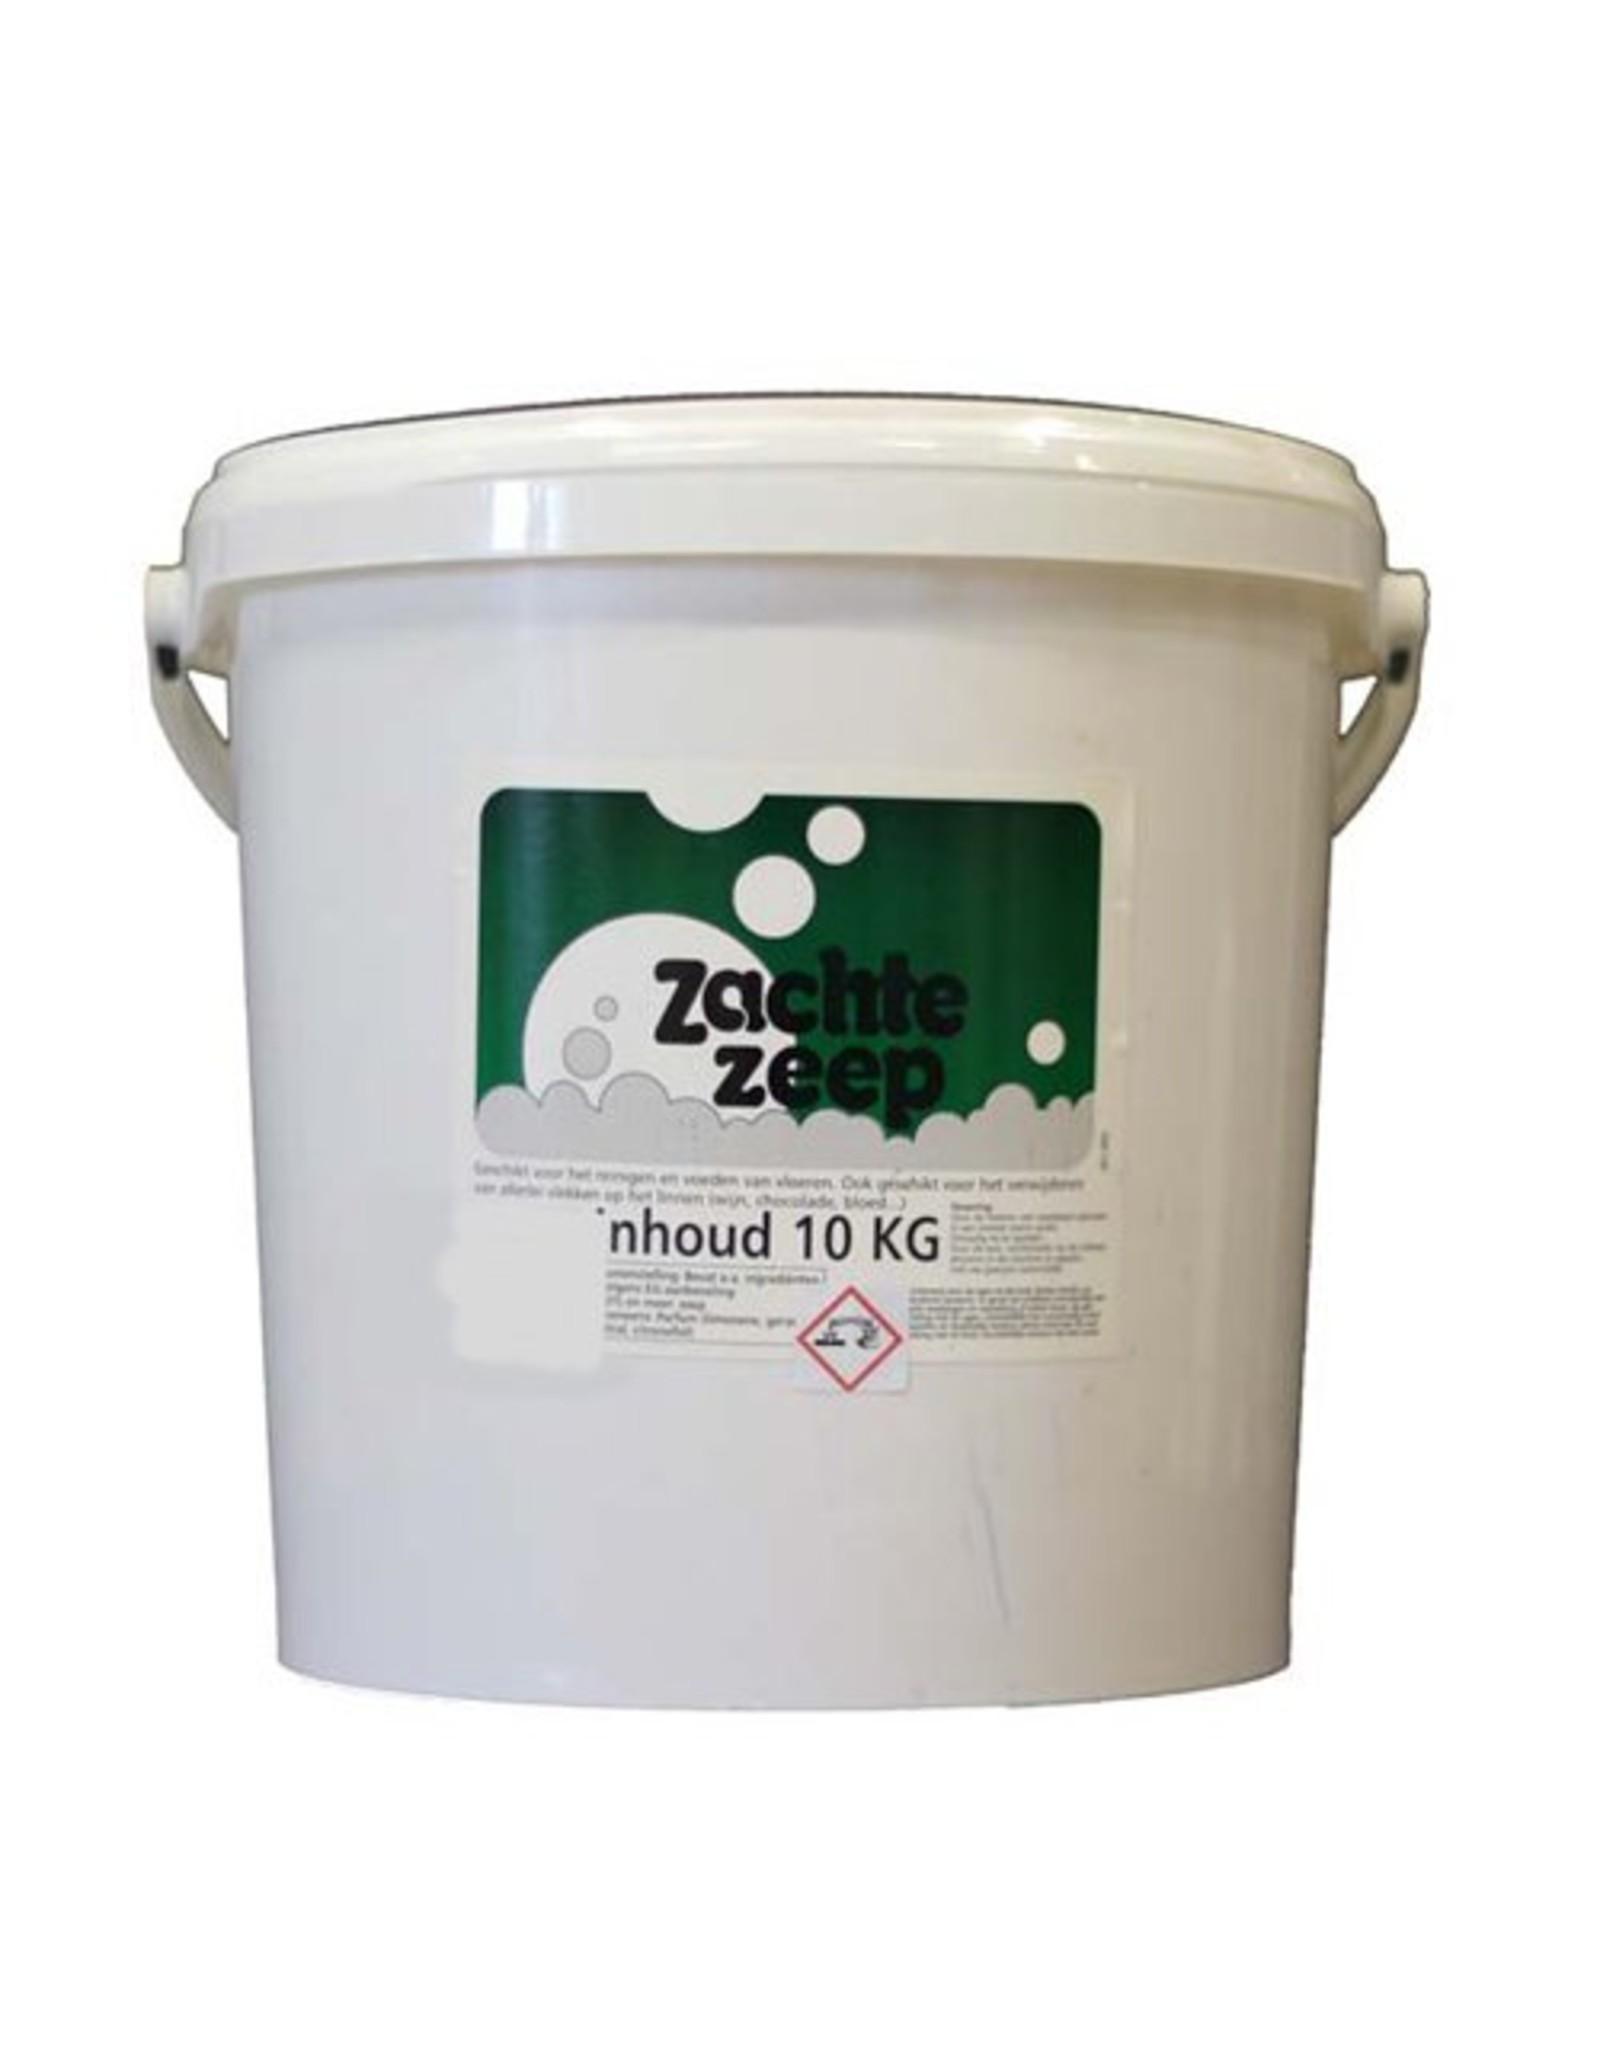 ACOR Zachte zeep 10 kg.